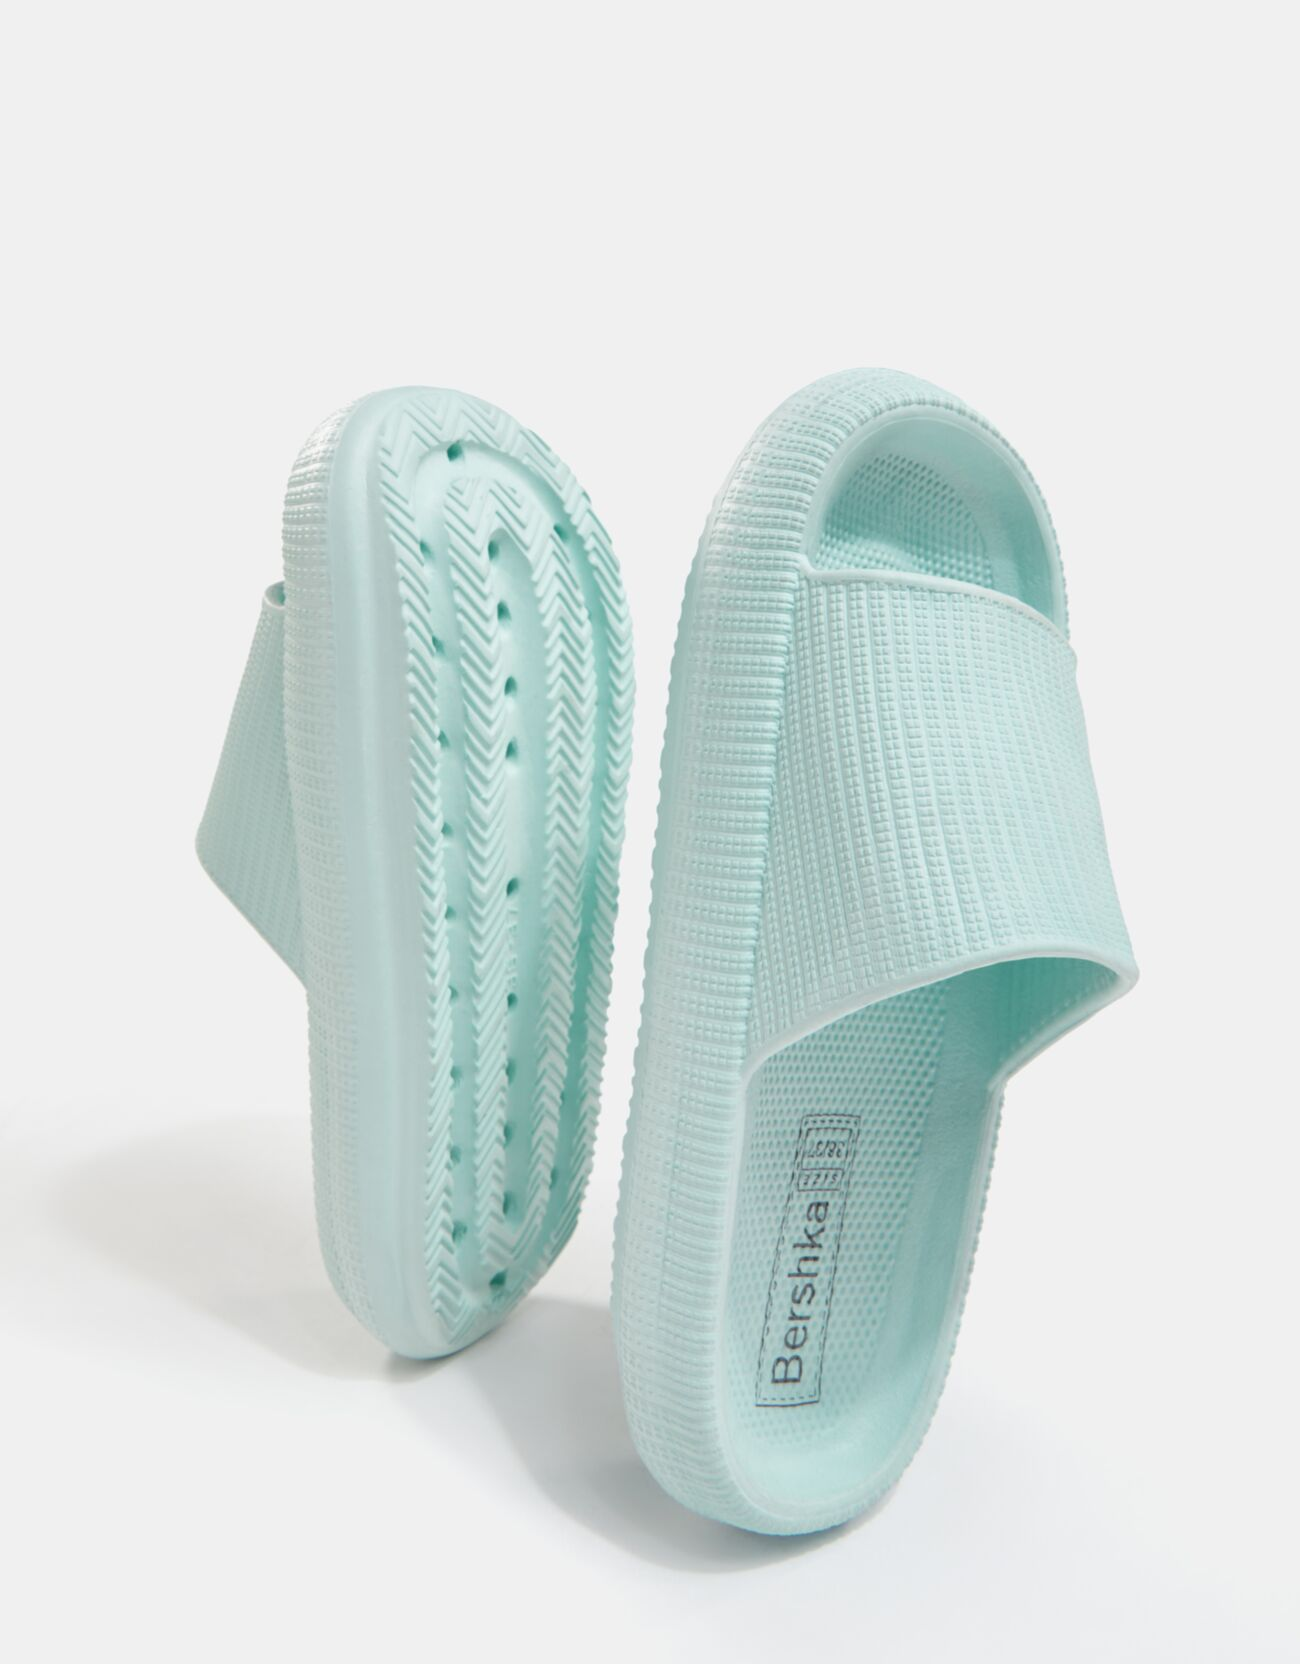 Sandalia plana textura.